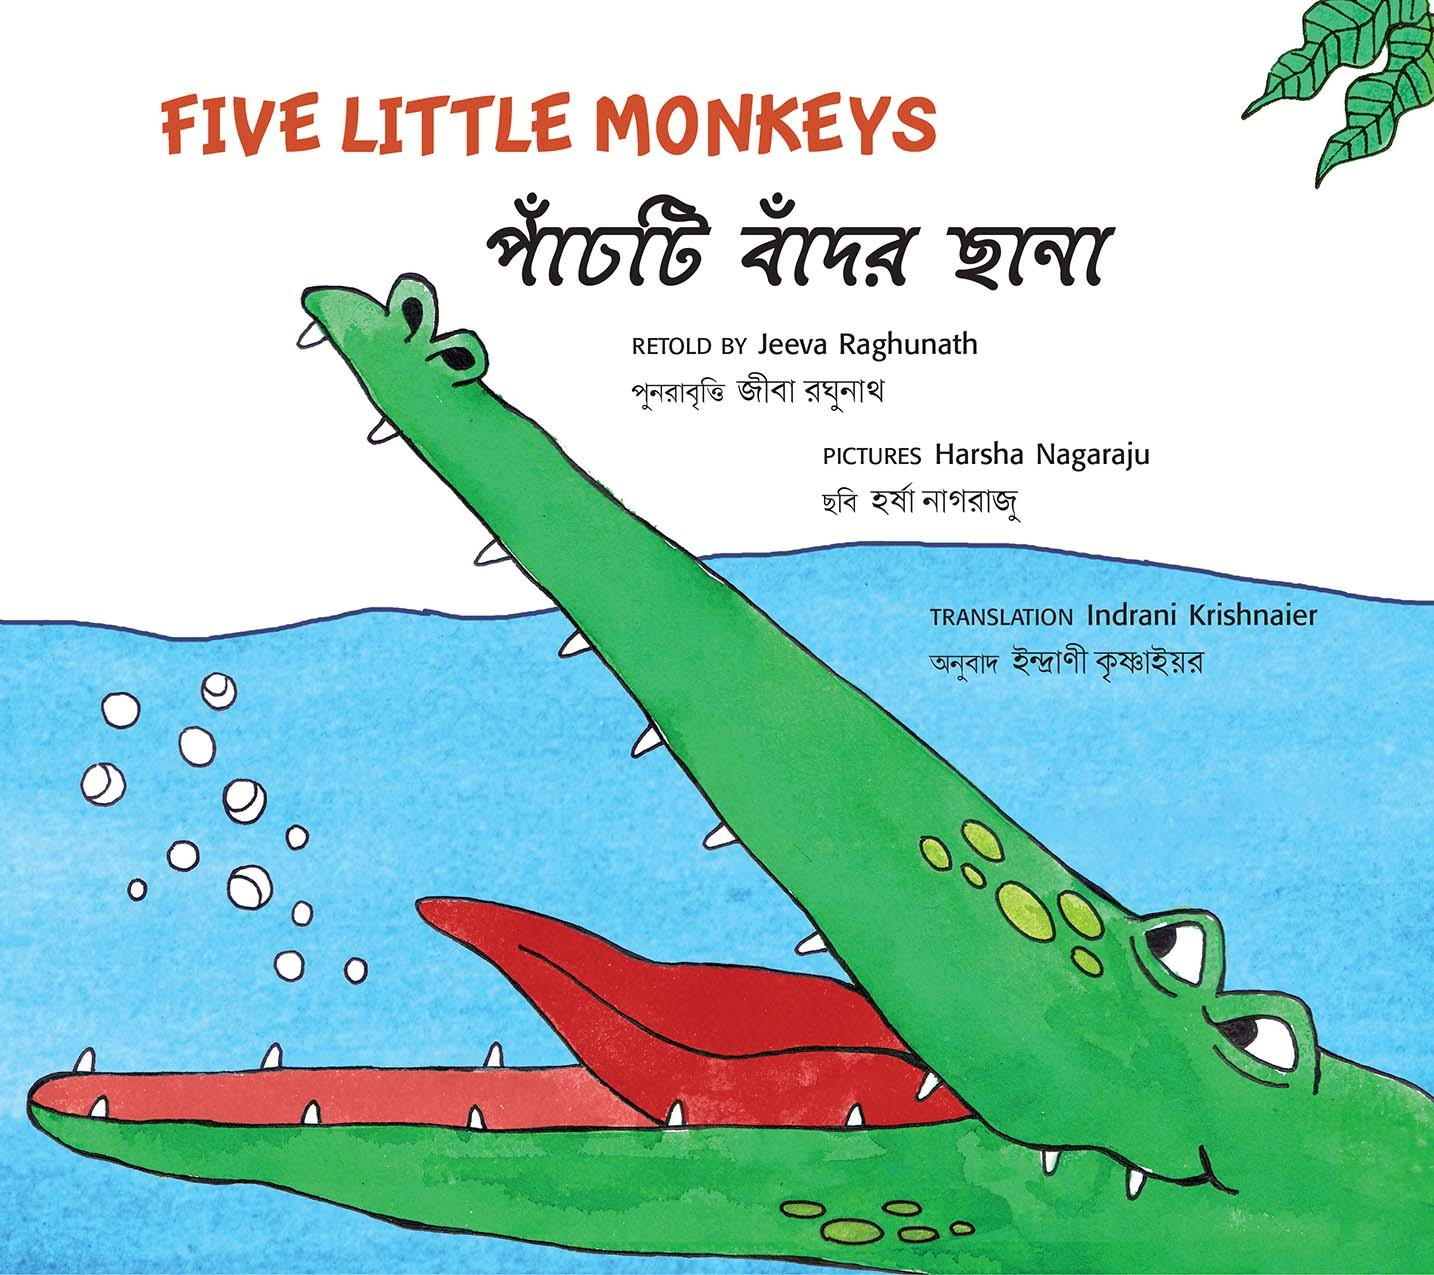 Five Little Monkeys/Panchti Baandor Chhaana (English-Bengali)